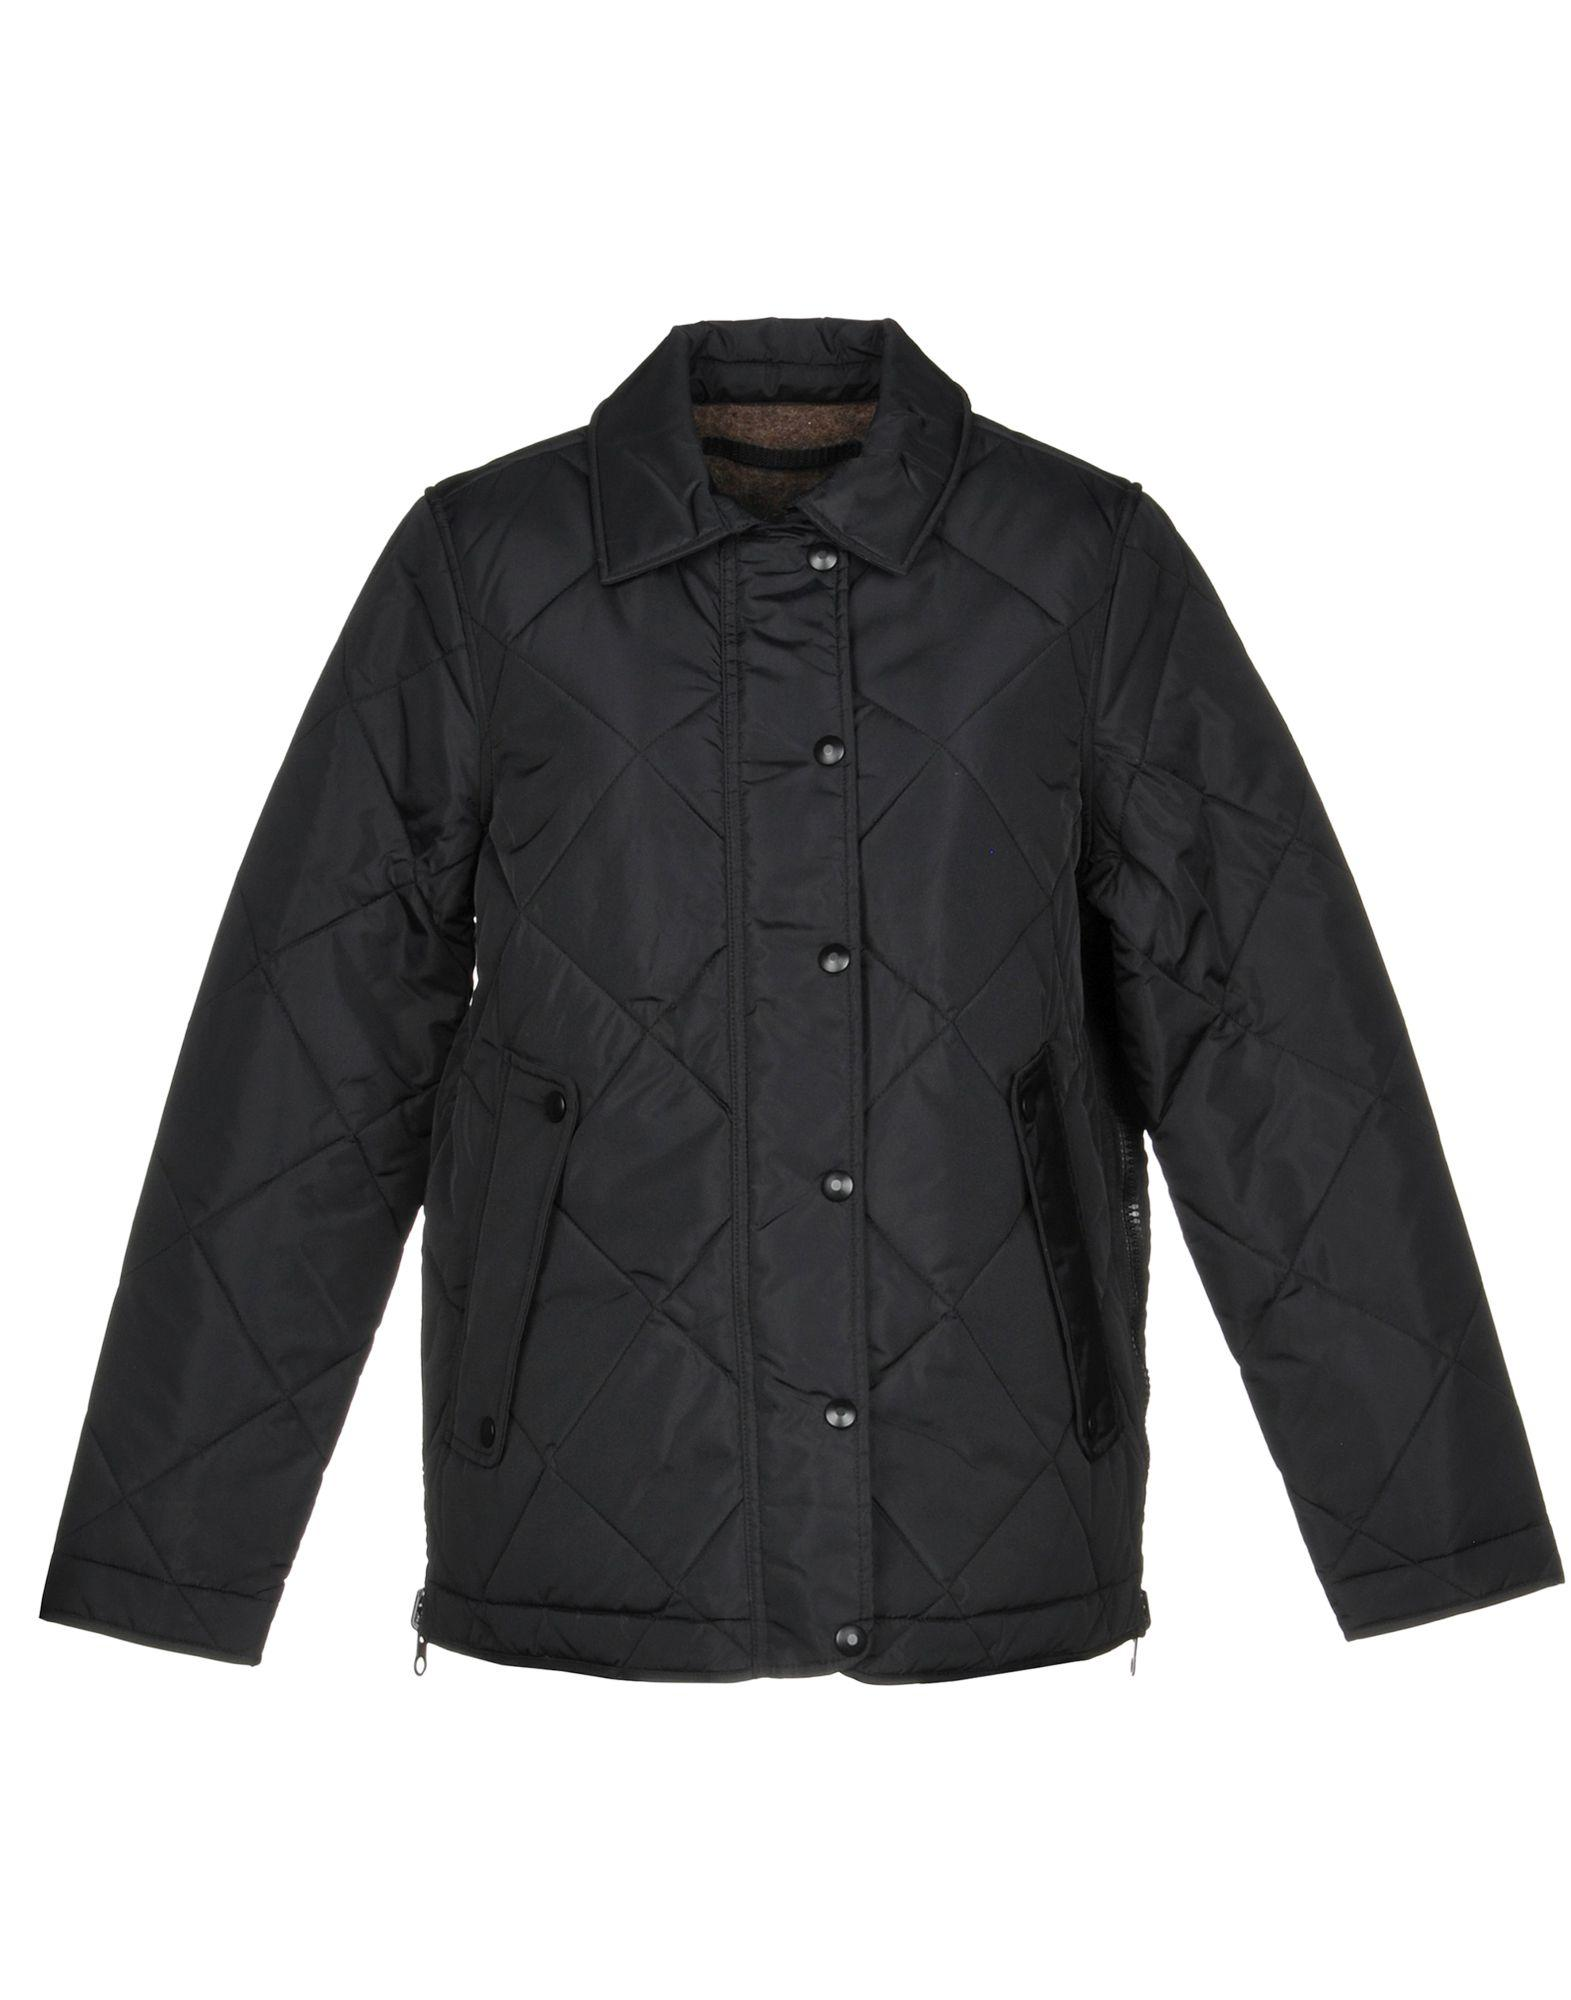 Sempach Jackets In Black